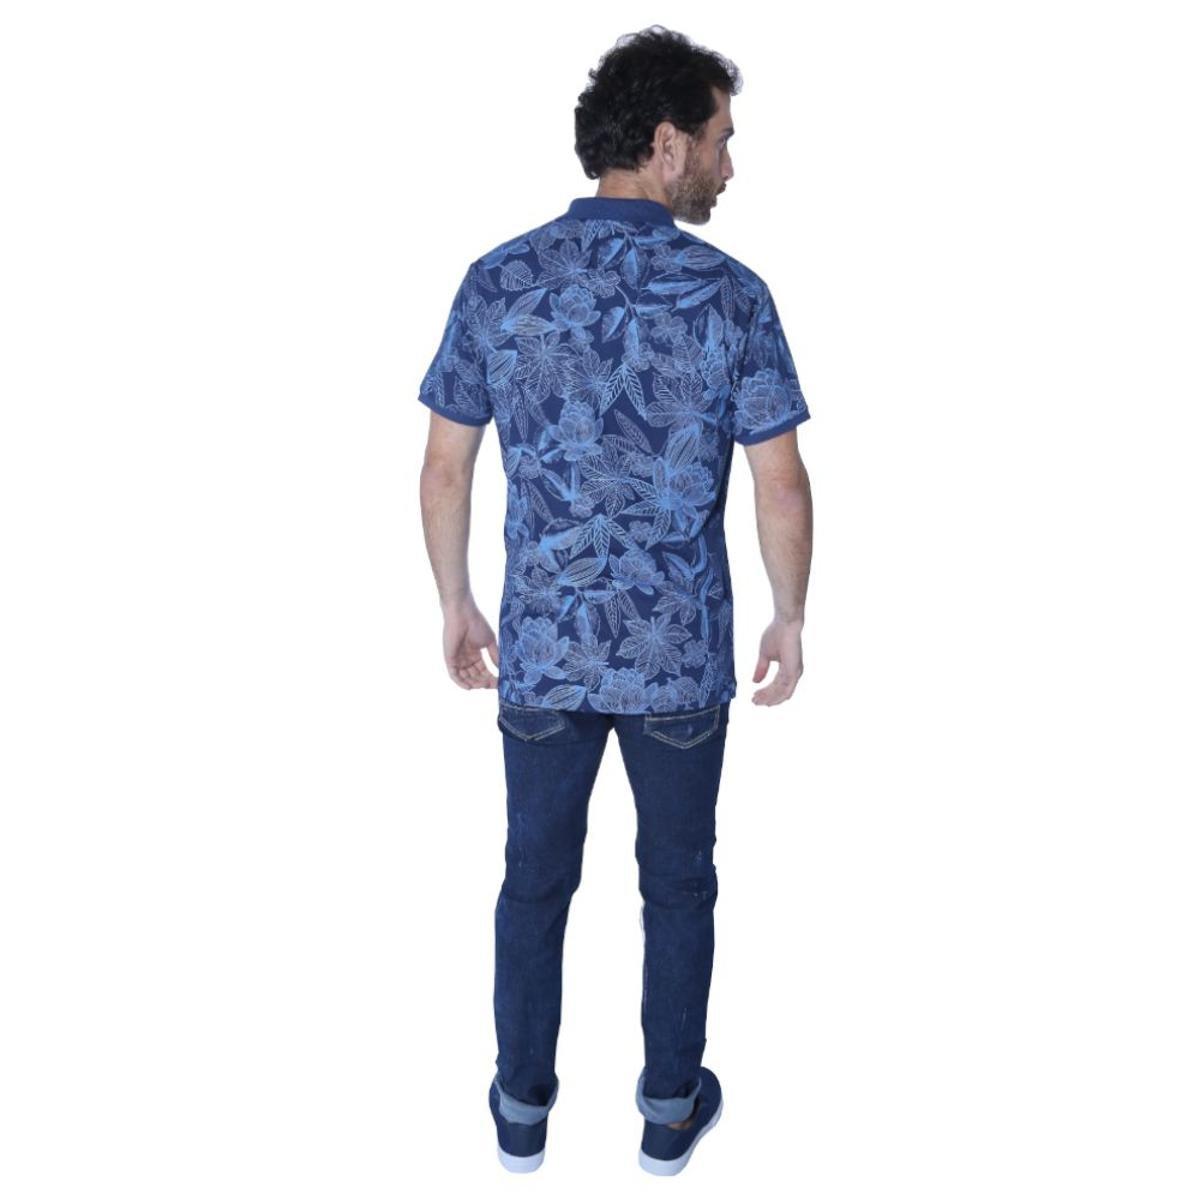 Camisa Polo Yacht Sport Full Print Flowers Masculina - Marinho